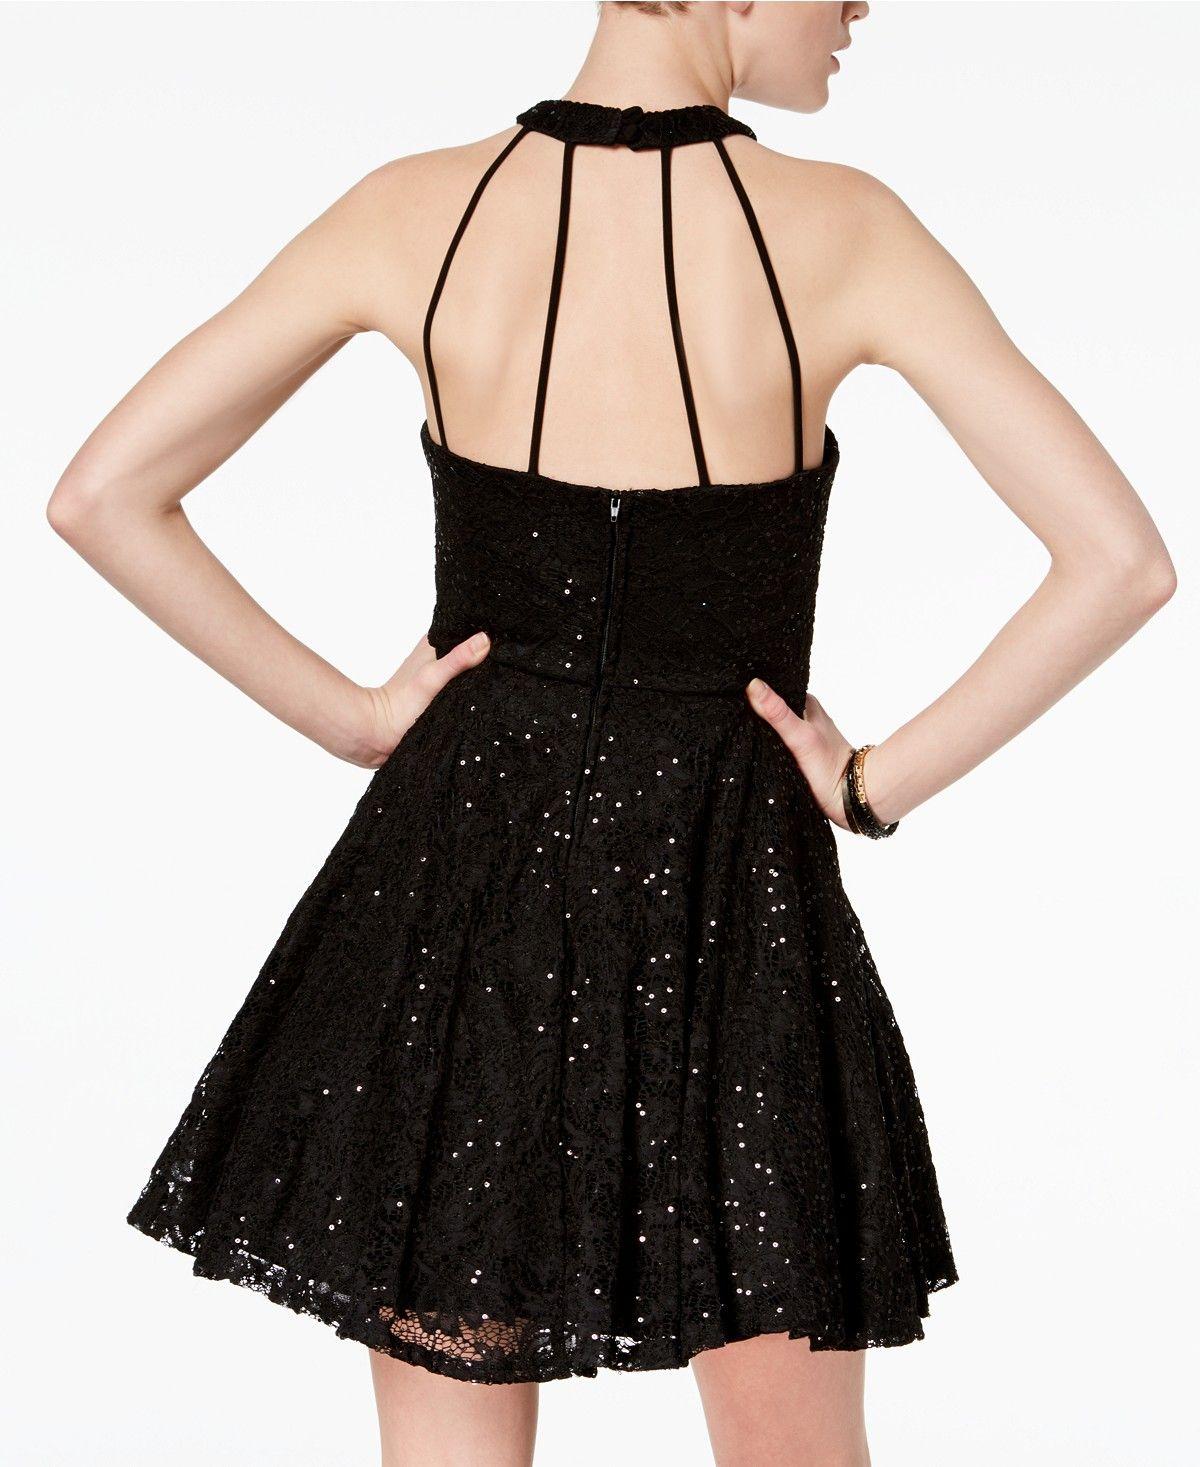 B darlin black lace dress  B Darlin Juniorsu Sequined Lace Halter Dress  Juniors Dresses